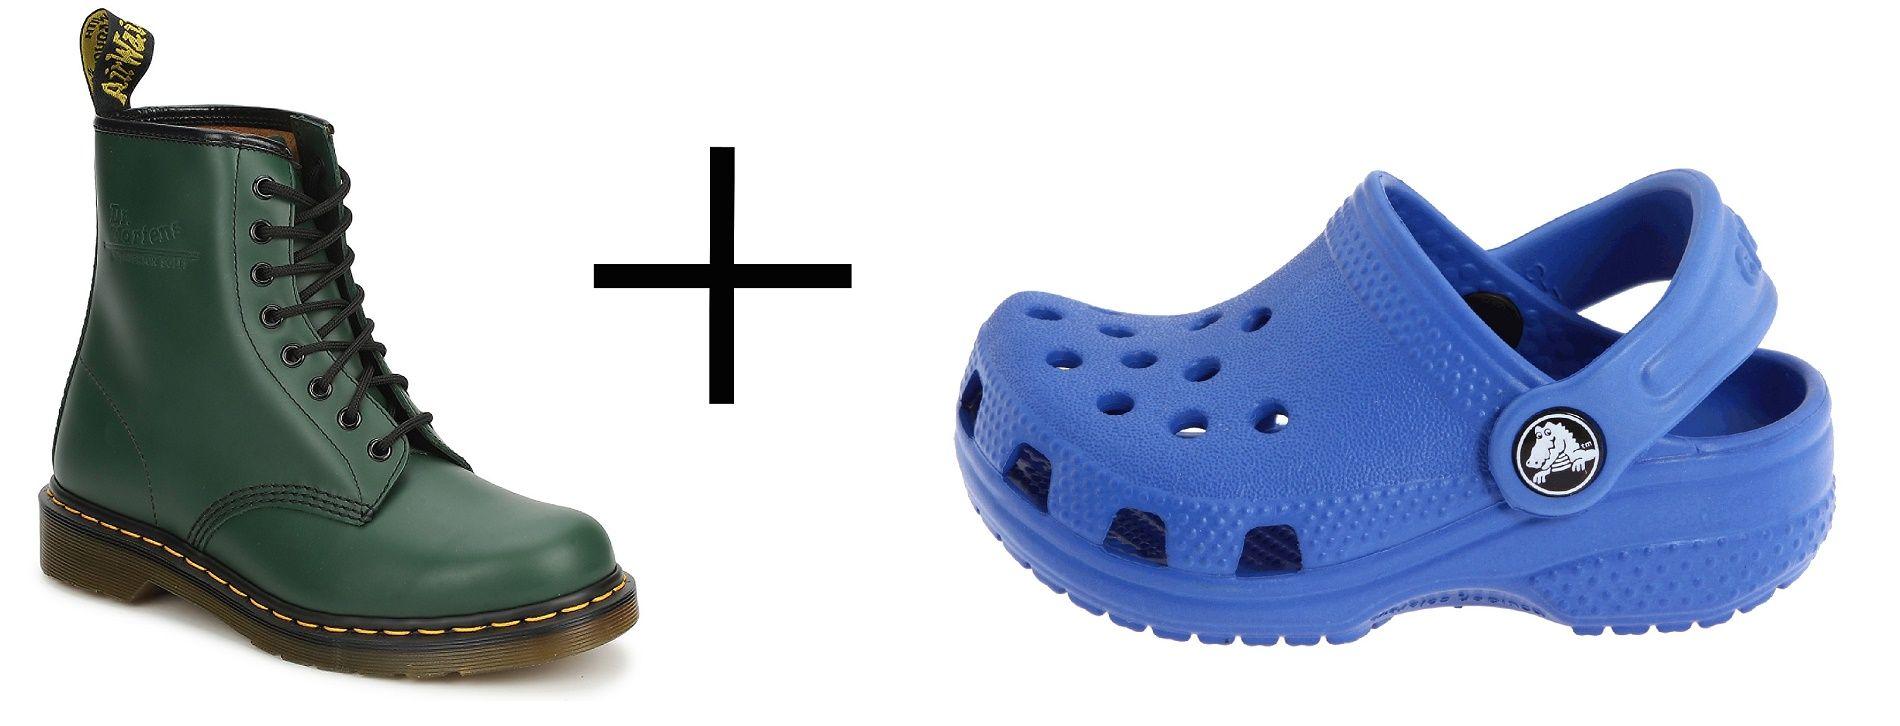 Cosa succede se le Dr Martens incontrano le Crocs?